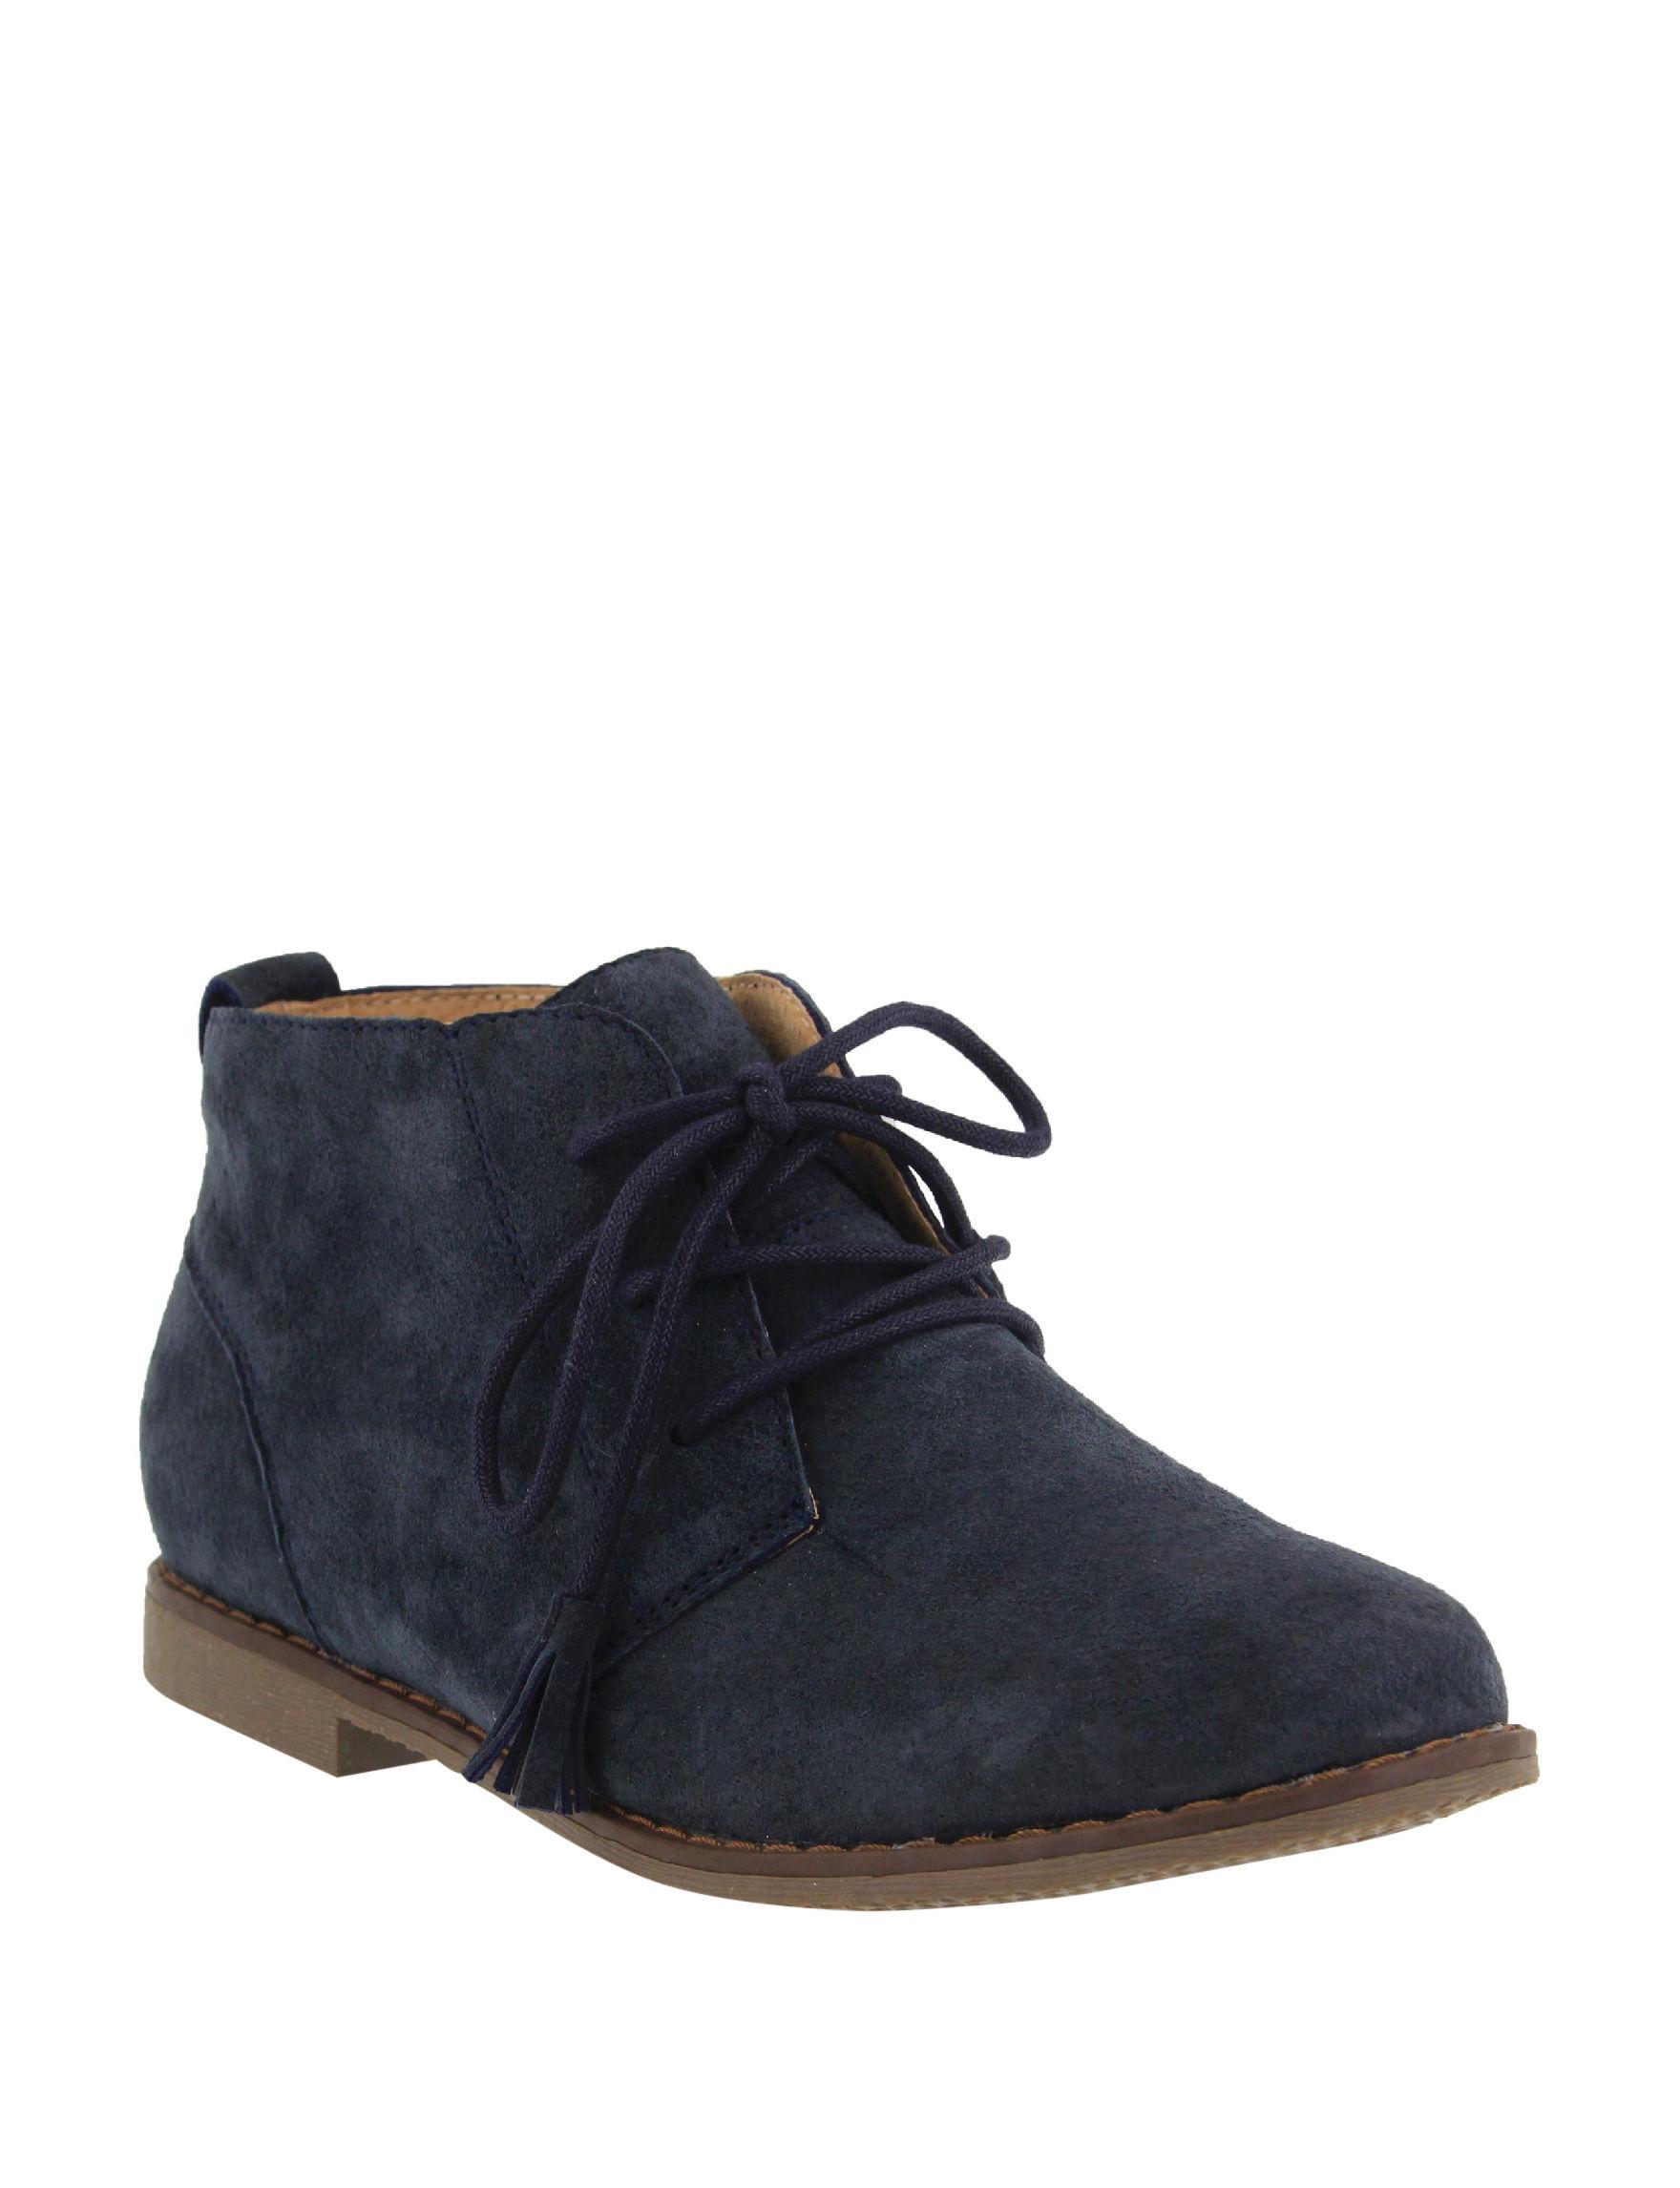 Spring Step Navy Chukka Boots